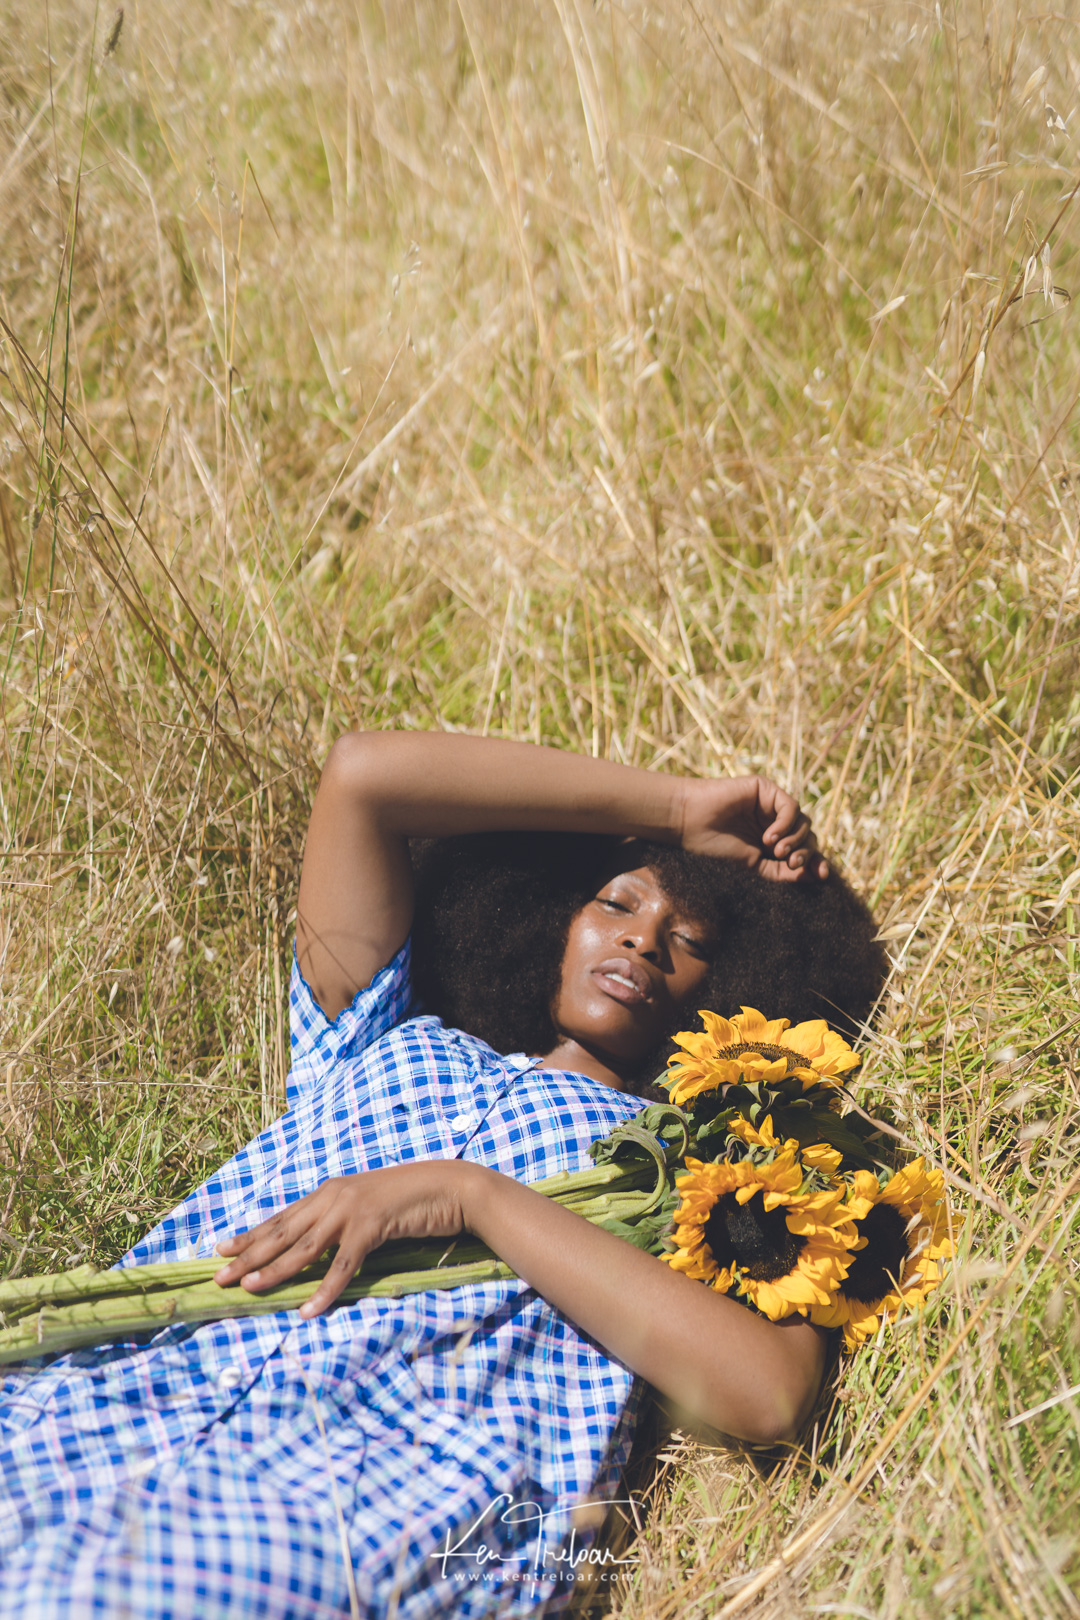 Ken Treloar Photography - Natural L-ight Editorial Portrait Fashion Photo Session - Cape Town Dec 2018-12.jpg